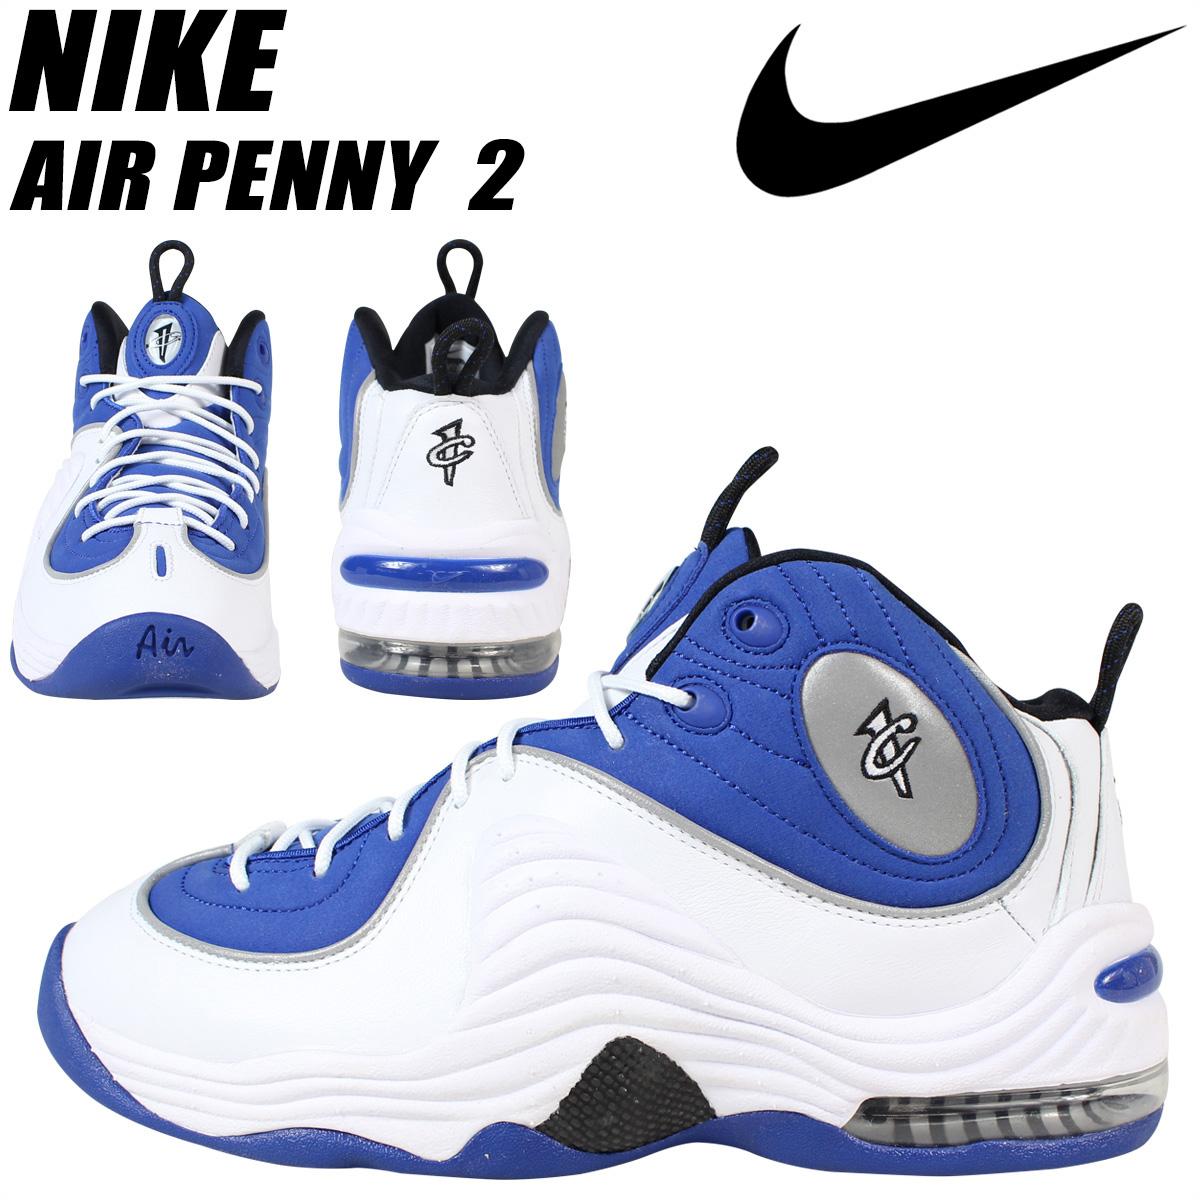 nike penny 2